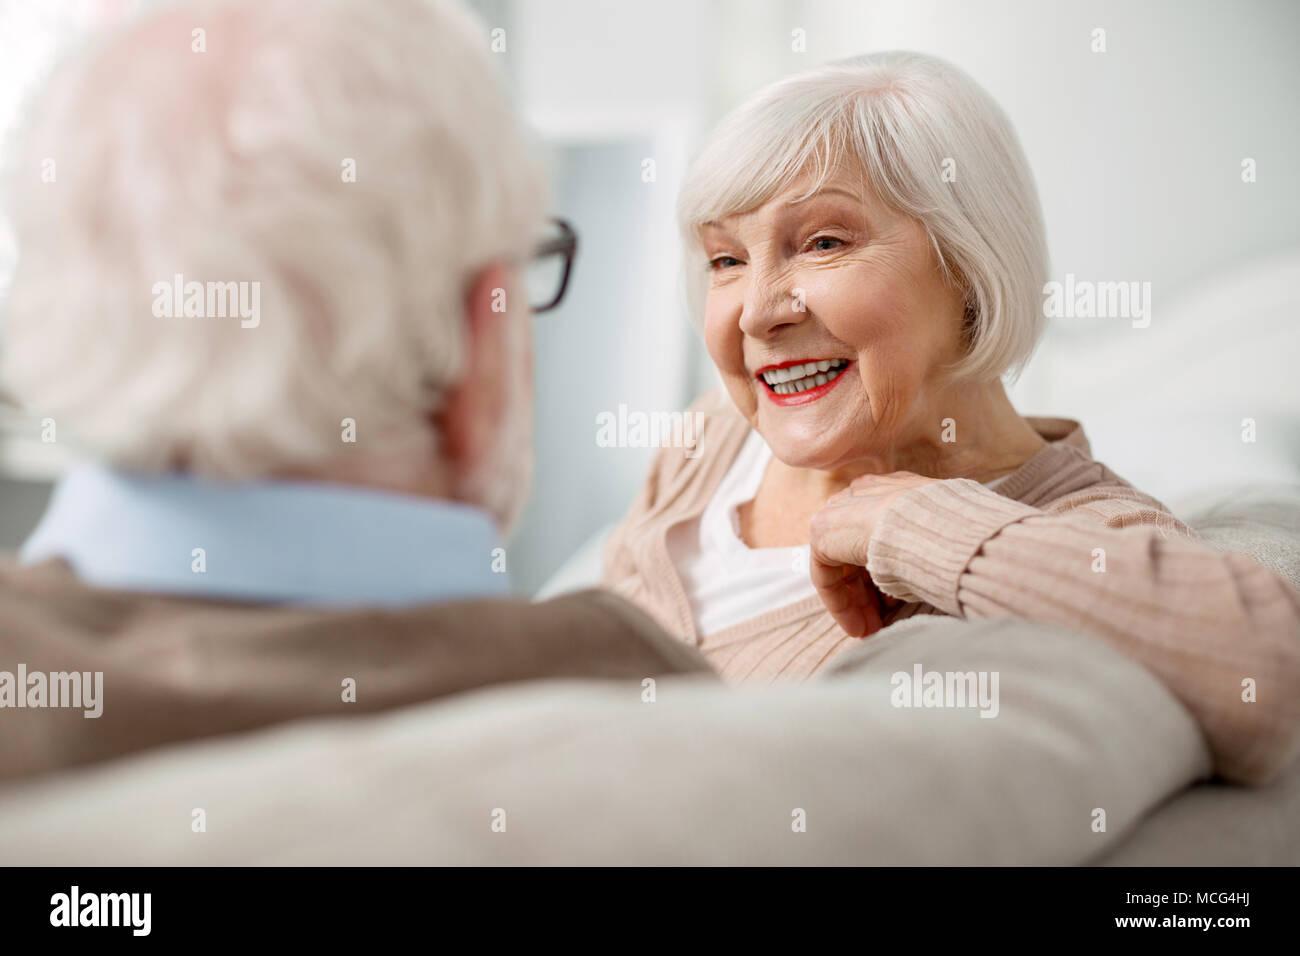 Portrait of elderly woman Photo Stock